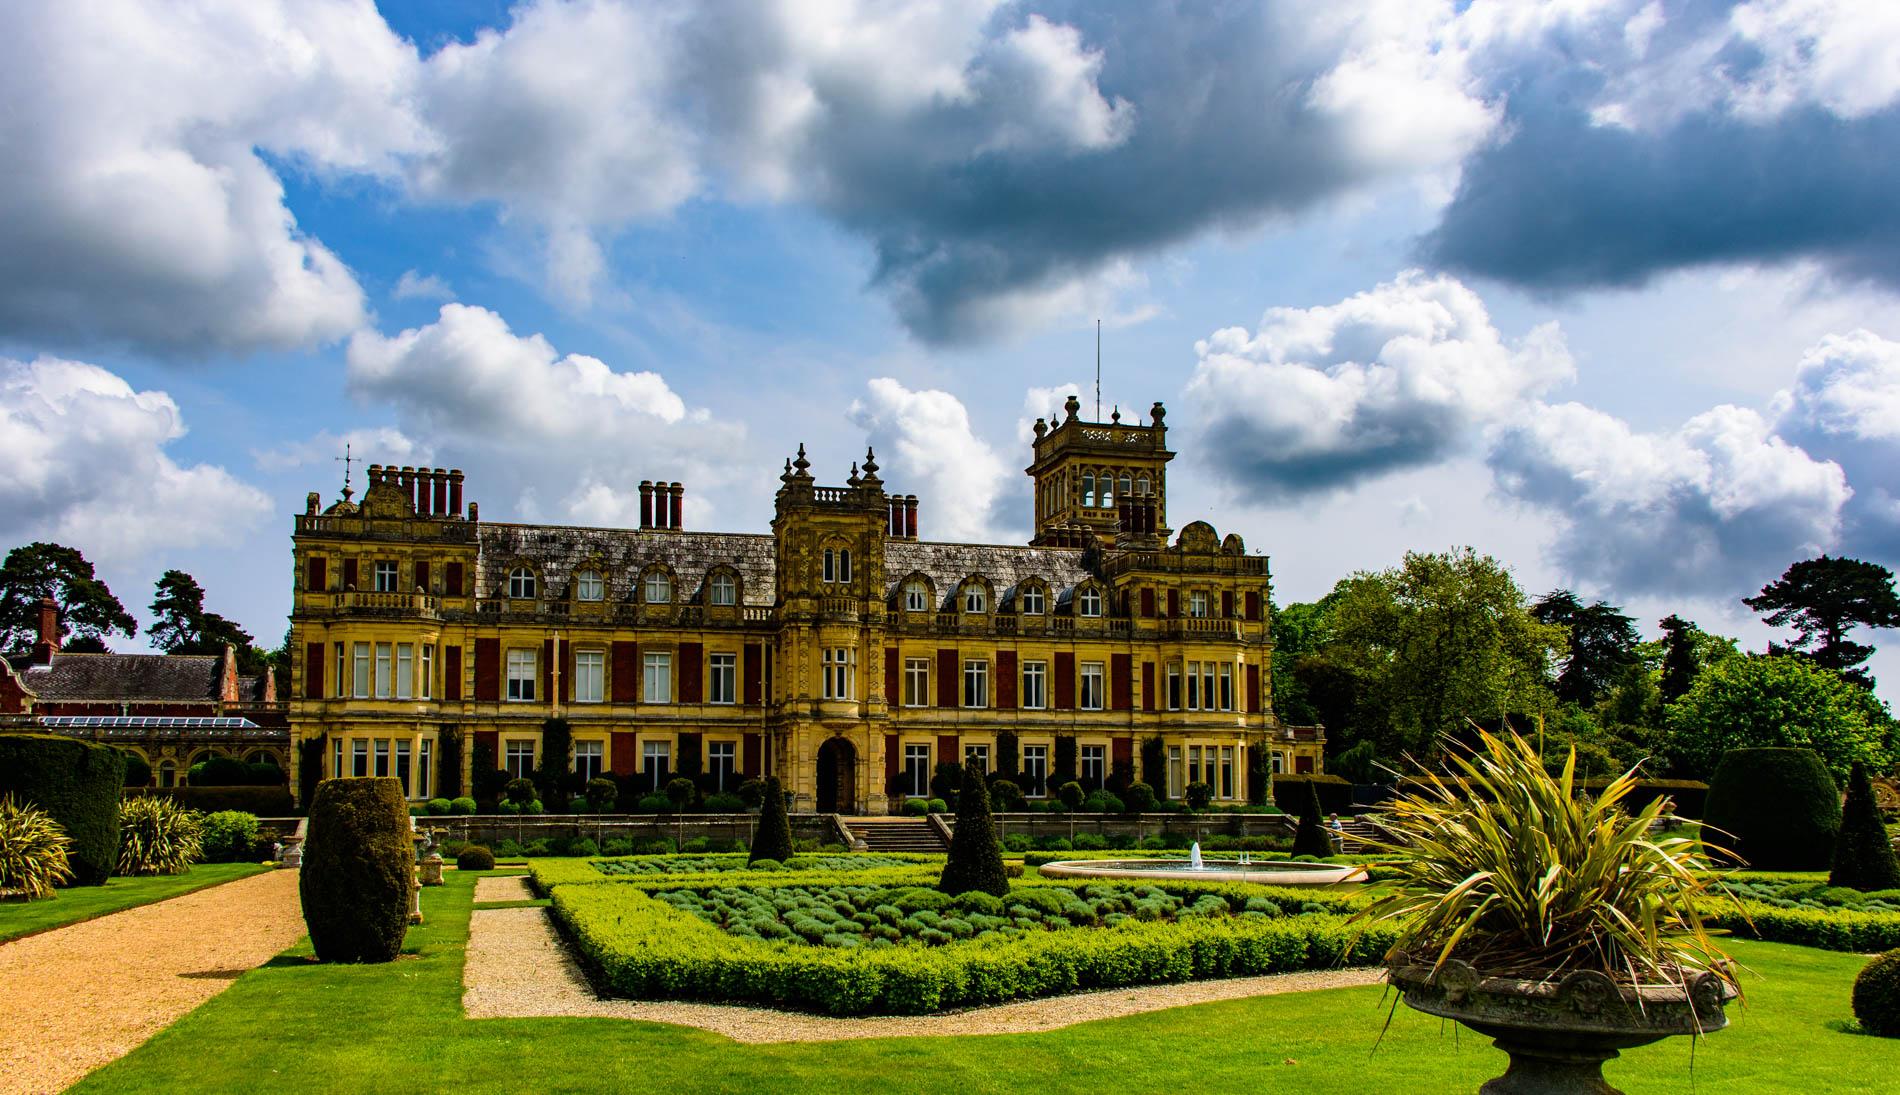 Norfolk, England